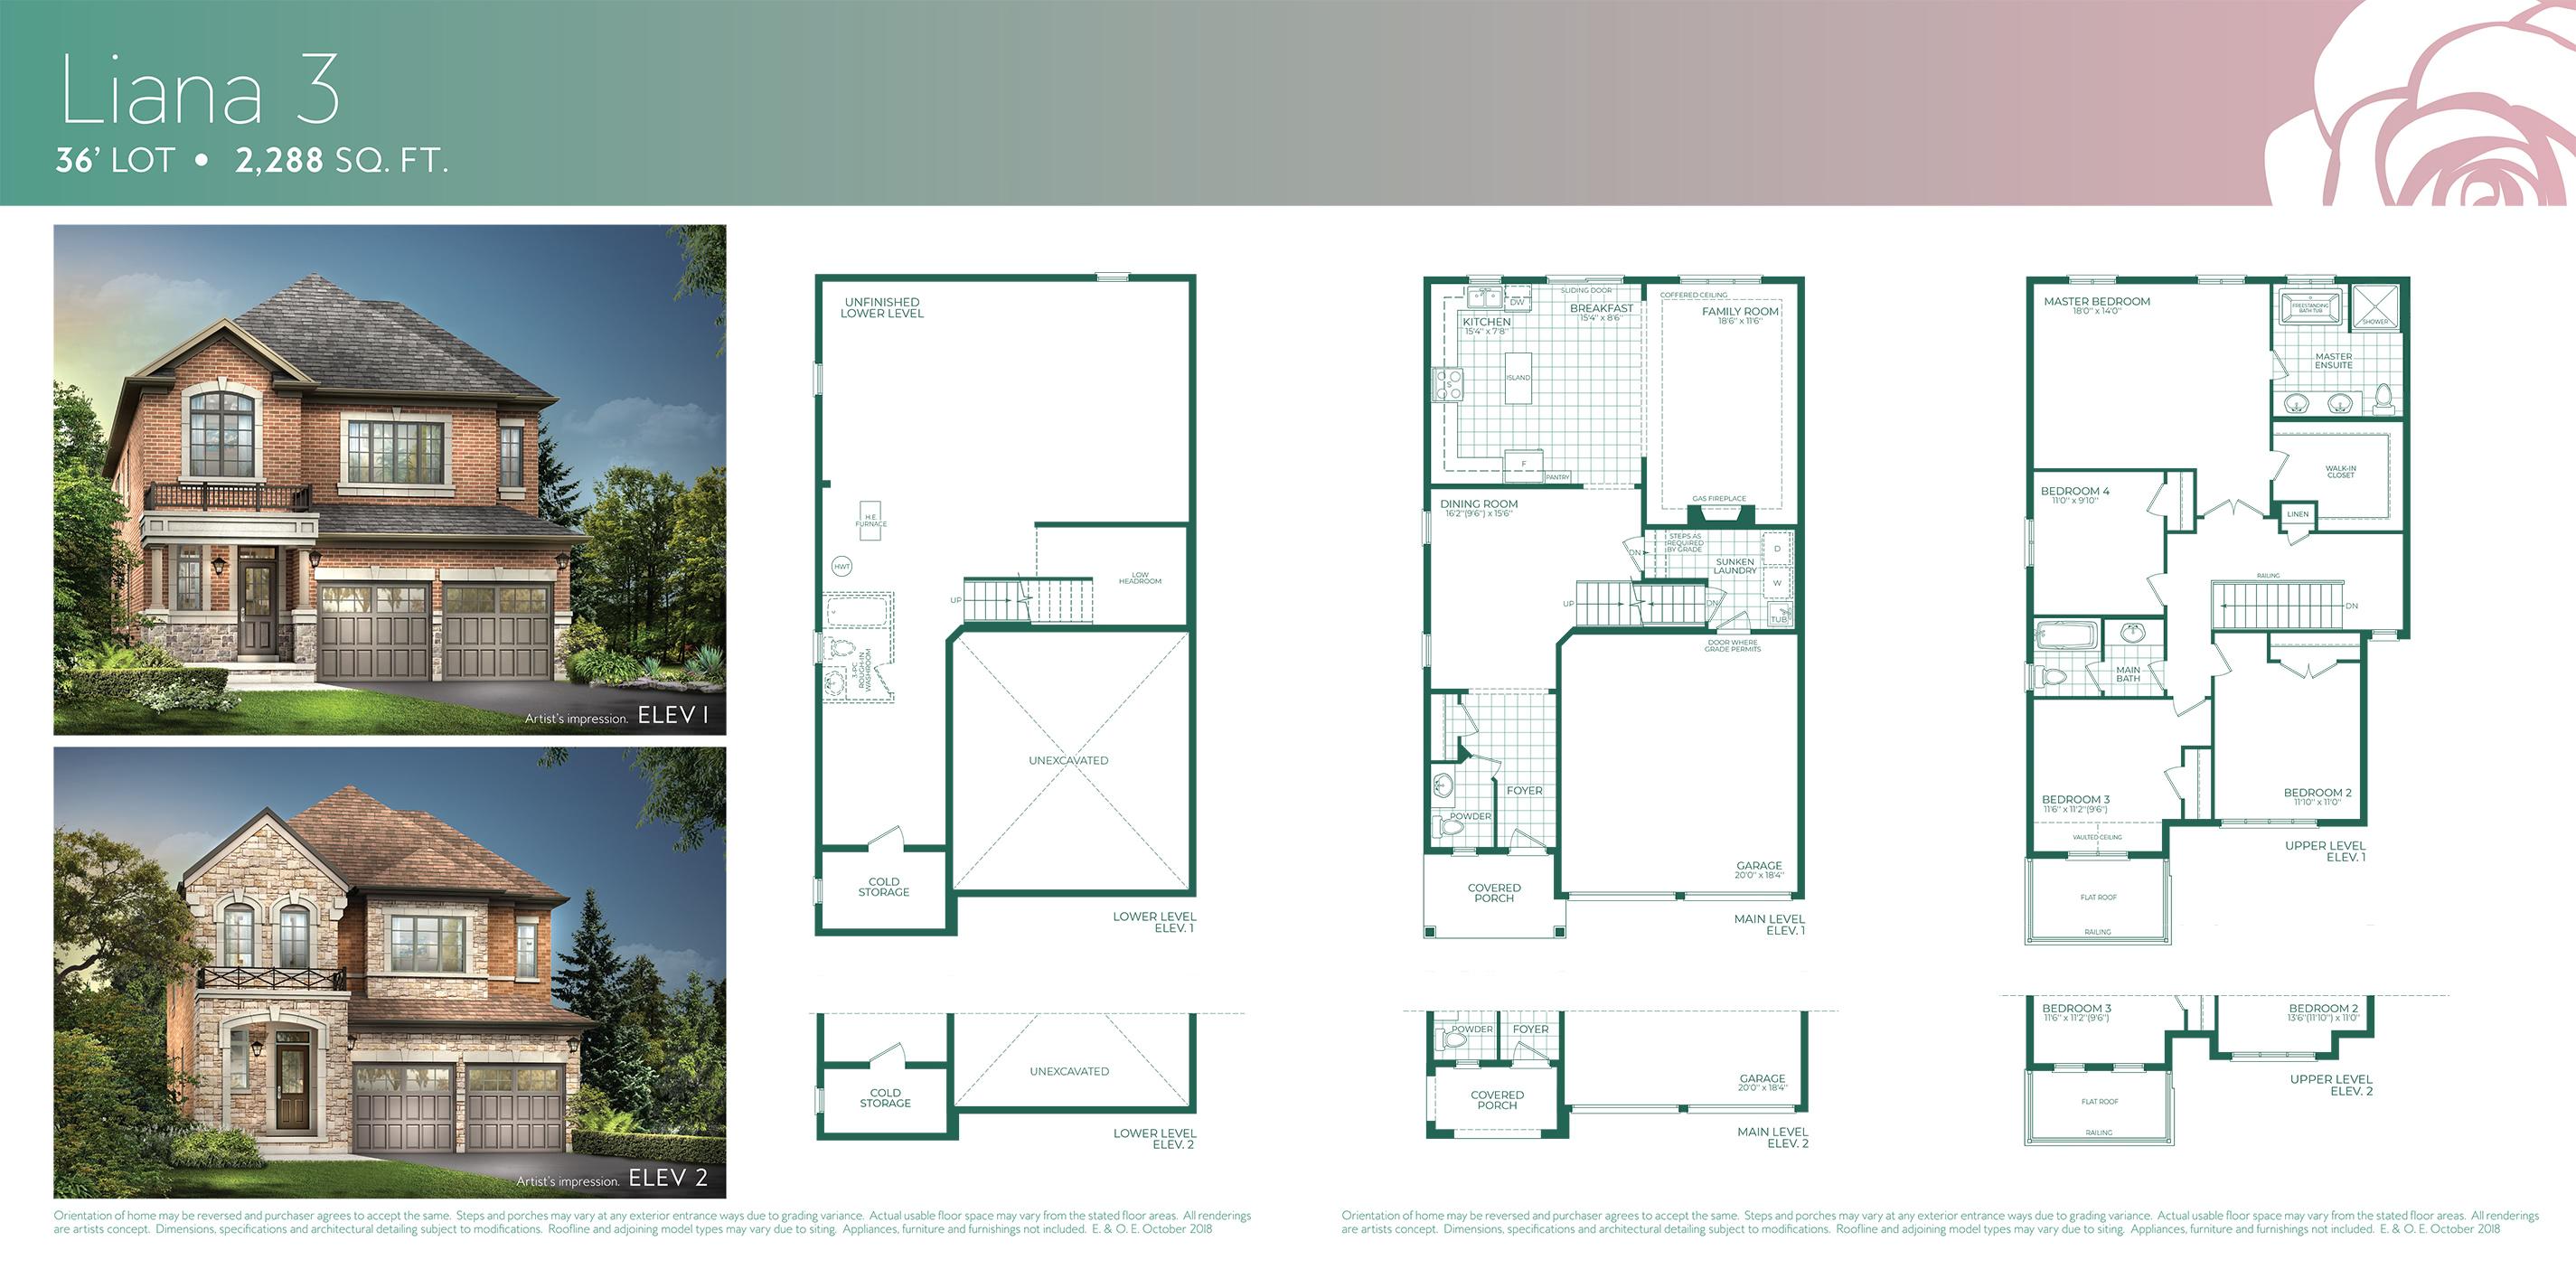 Liana 3 Floorplan